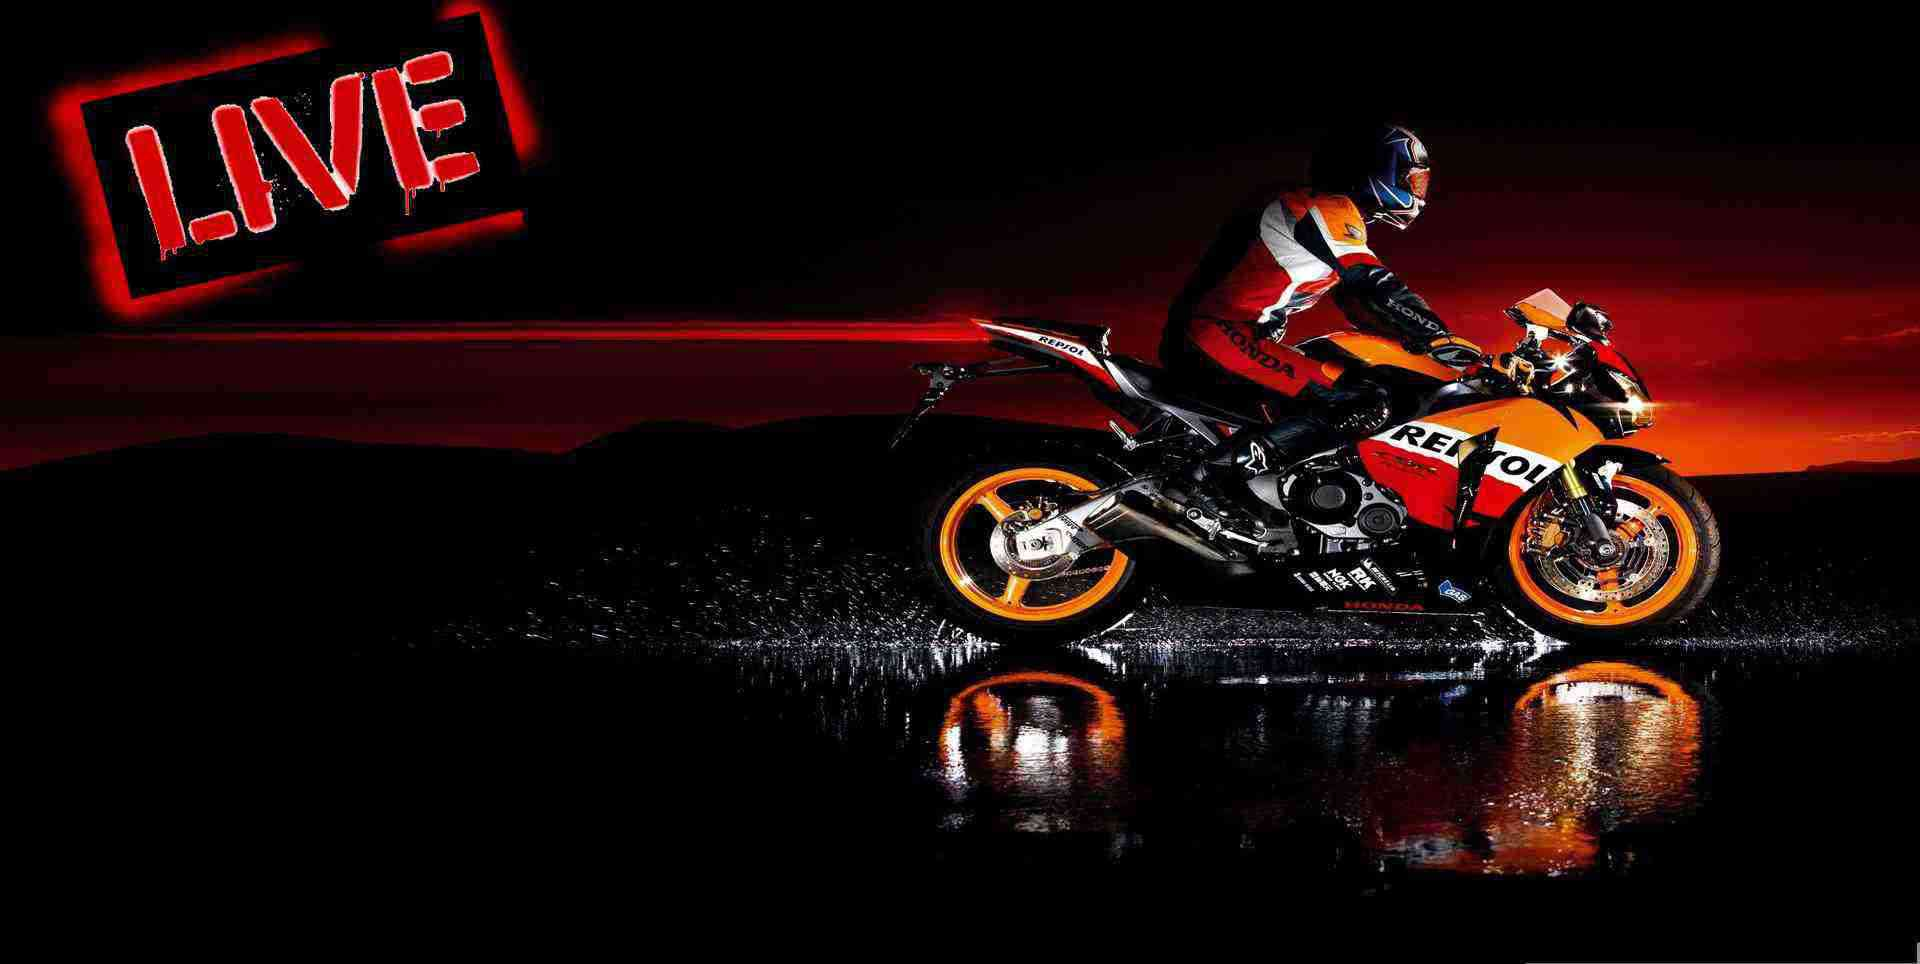 motogp-thailand-2018-race-live-stream